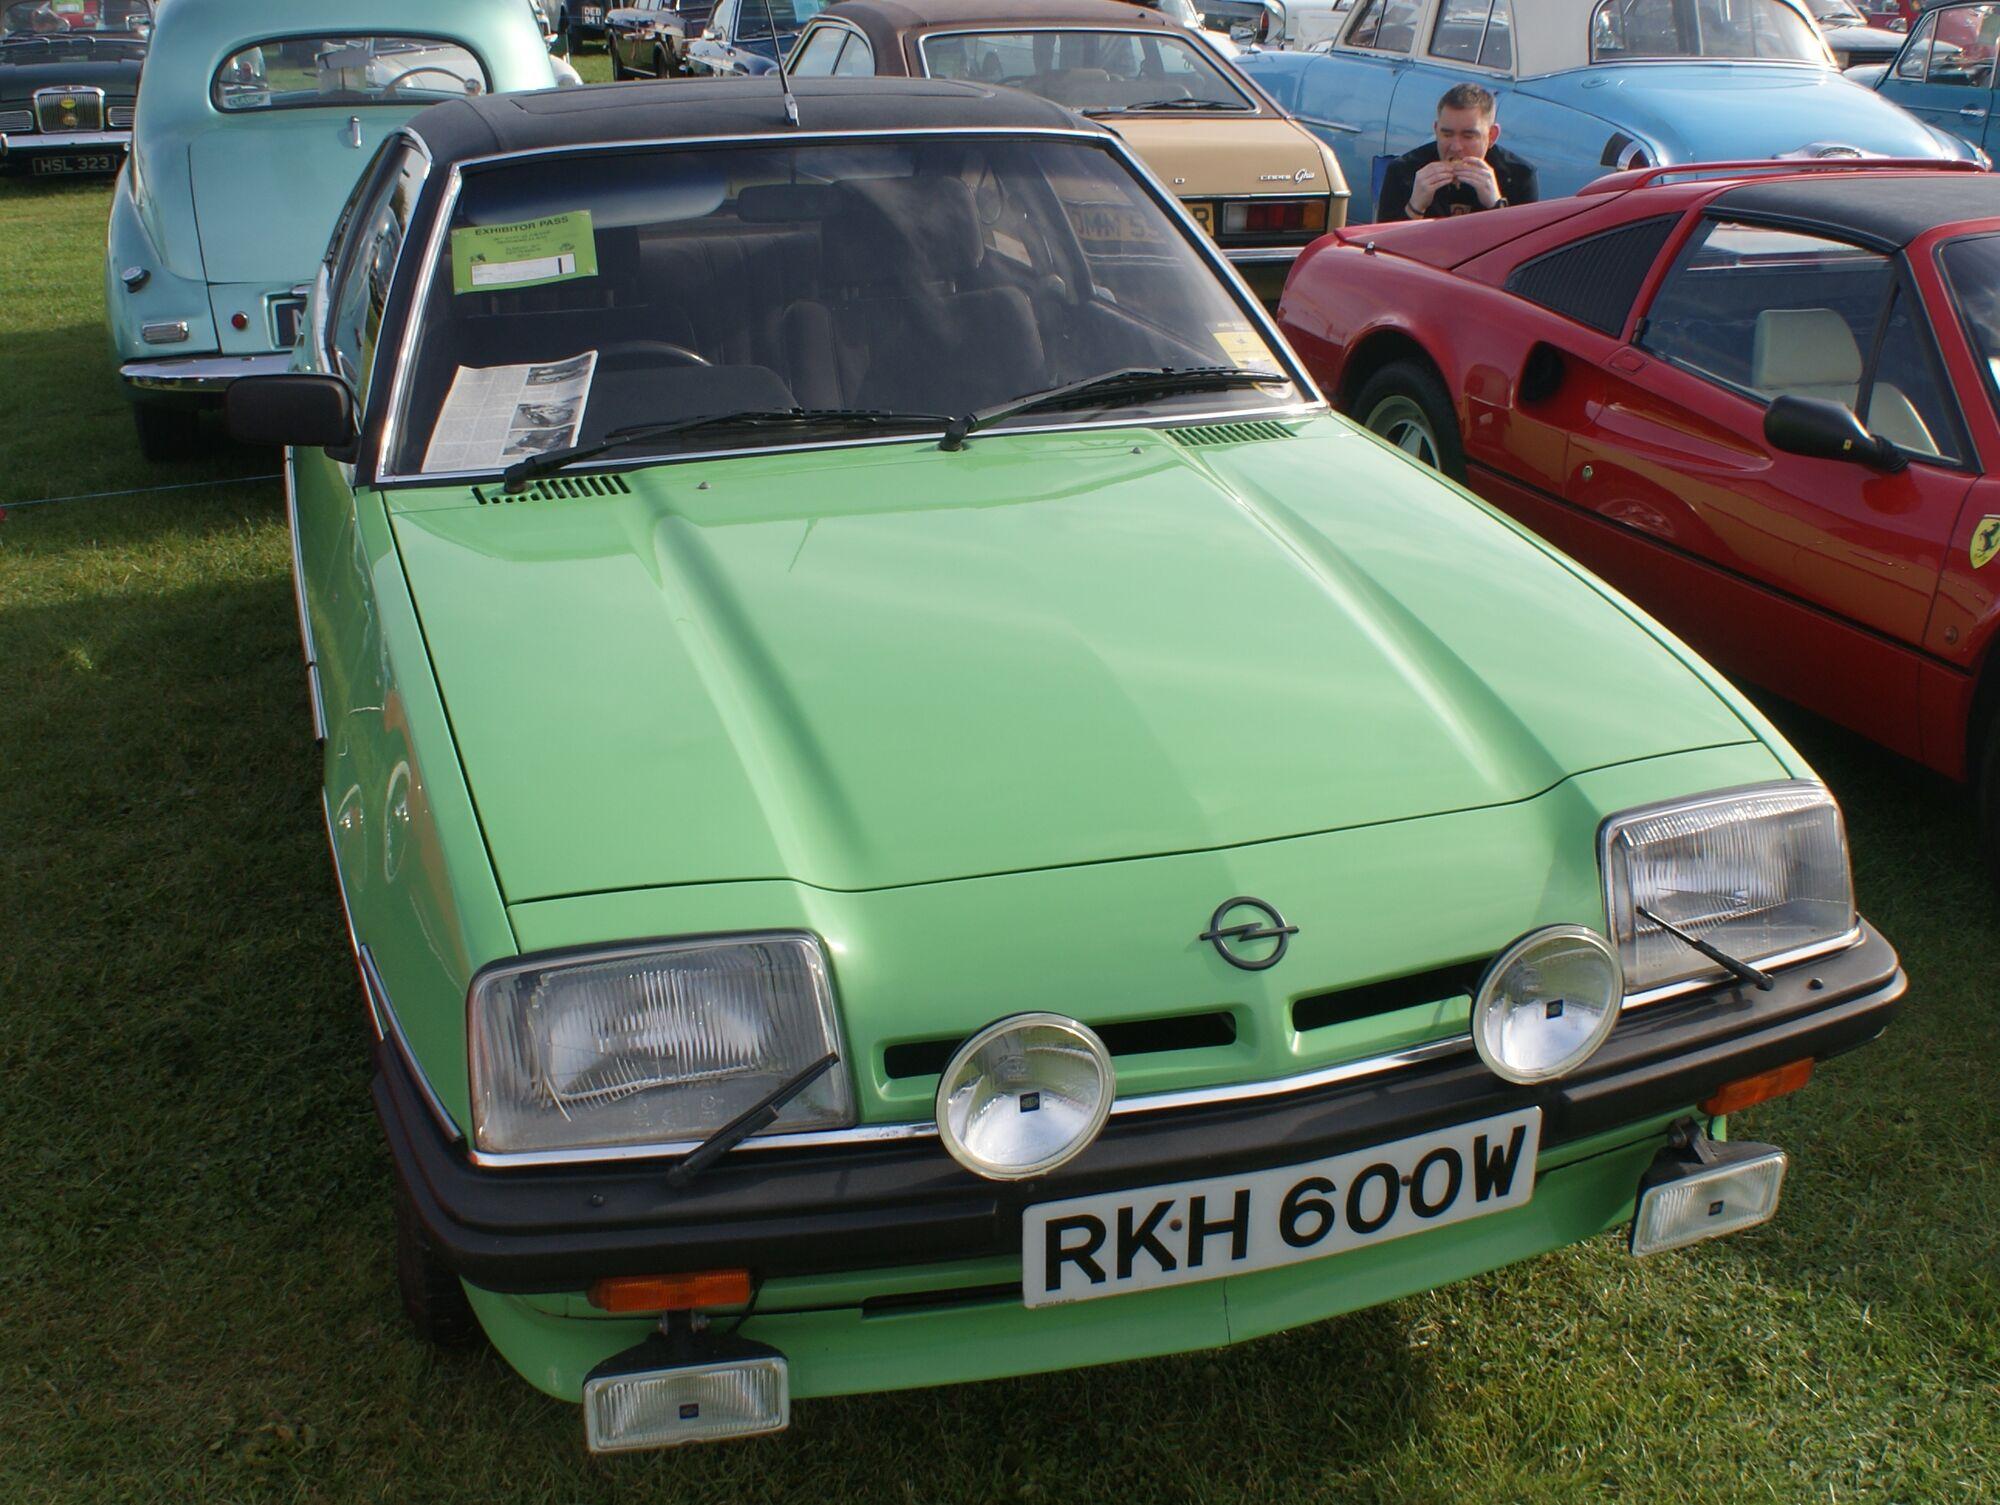 Opel Manta Classic Cars Wiki Fandom Powered By Wikia 1973 Interior